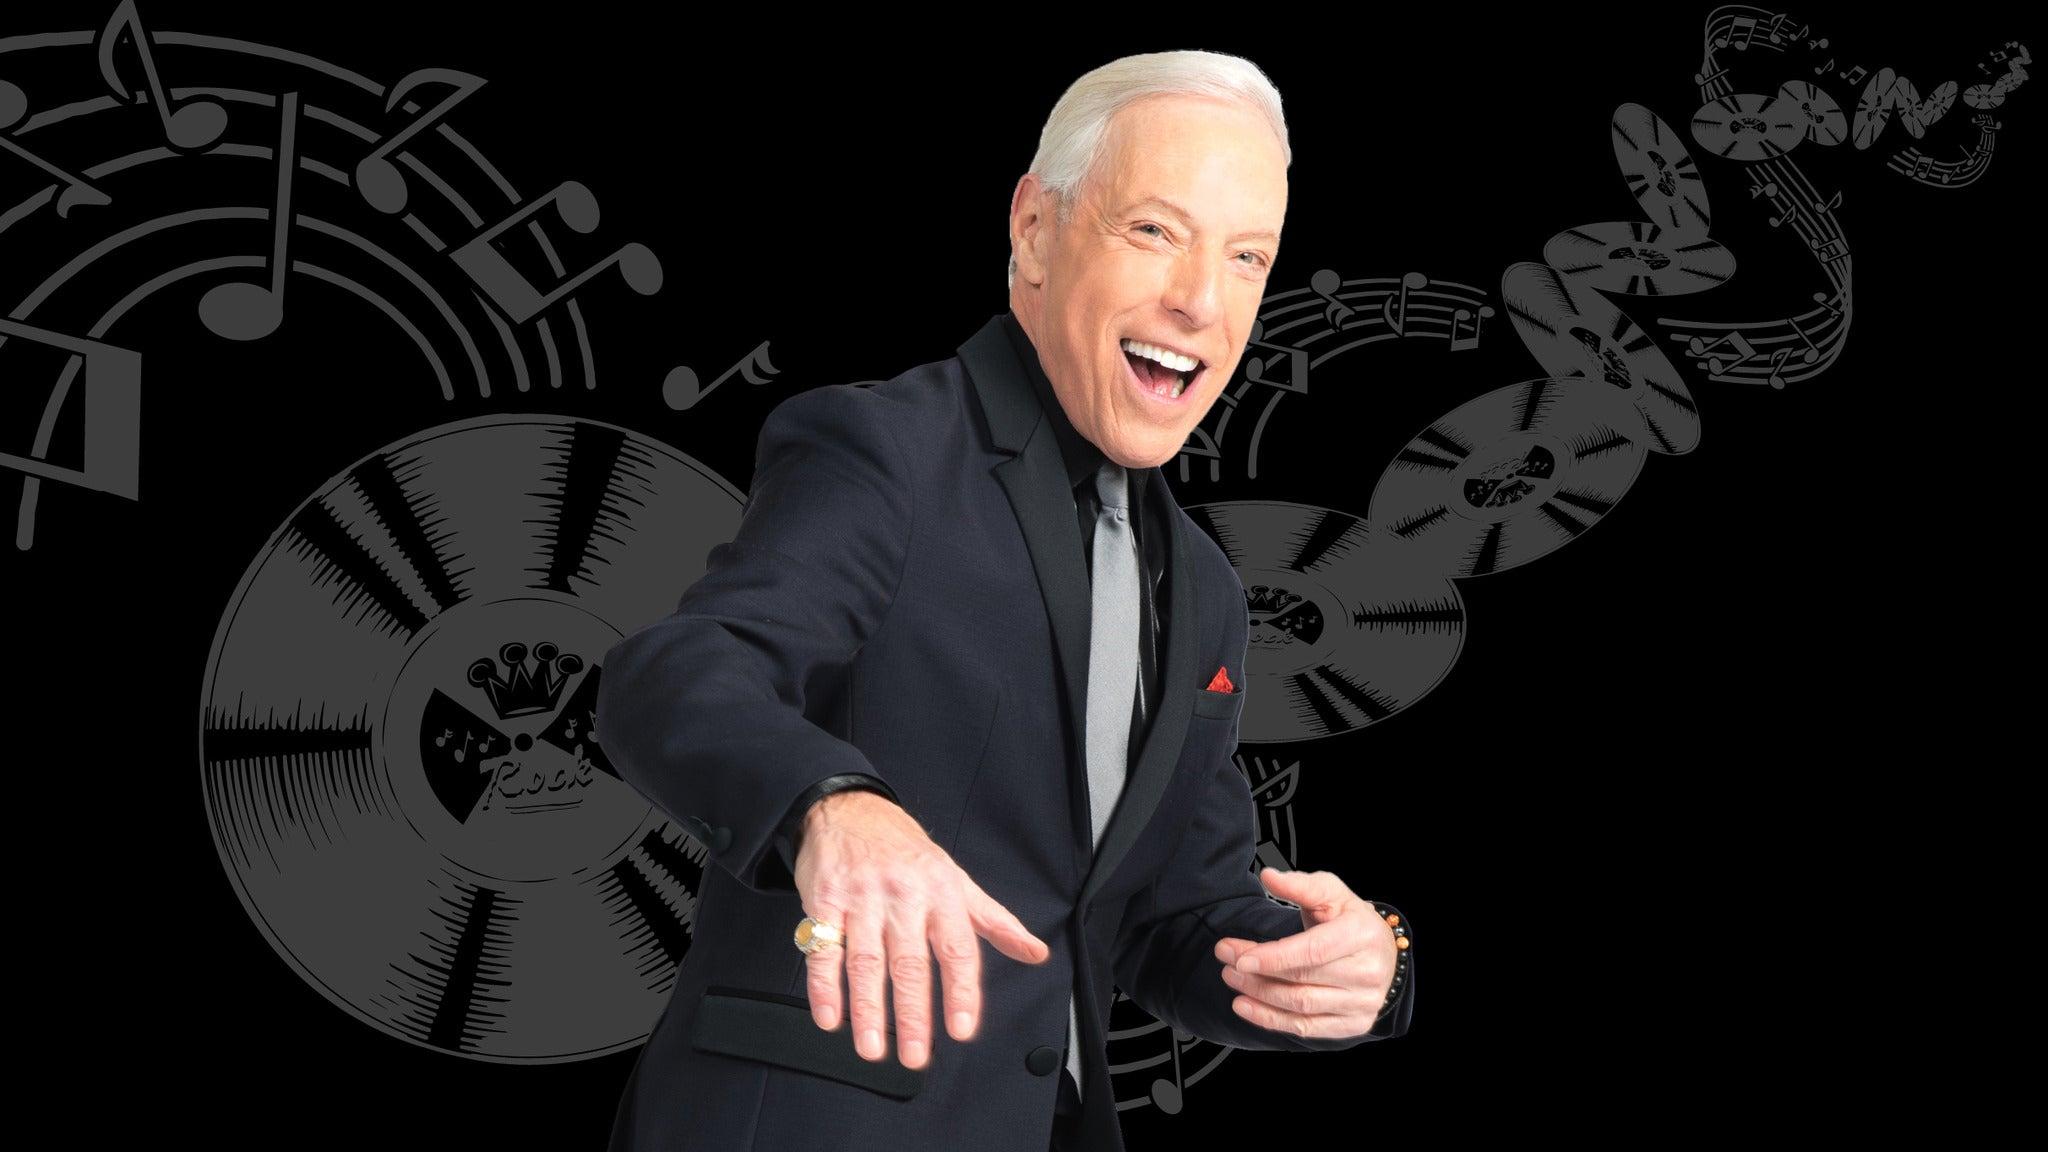 Jerry Blavat